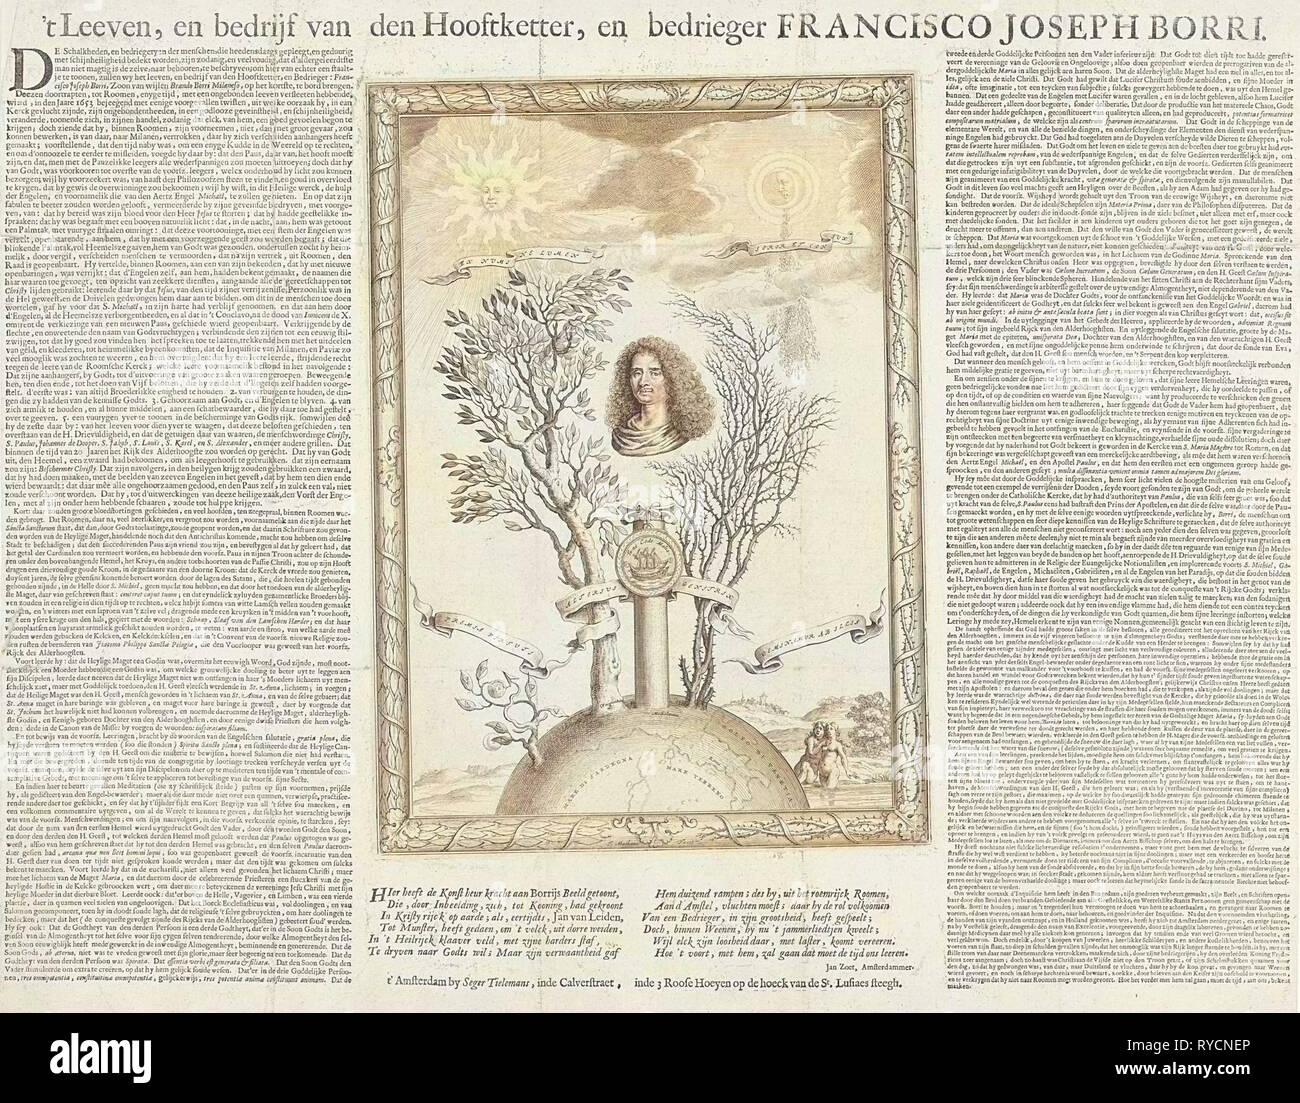 Allegory with the portrait of Gioseppe Francesco Borri, print maker: Theodor Matham, Jan Zoet falsification of, Seger Tielemans, 1662 - 1666 - Stock Image